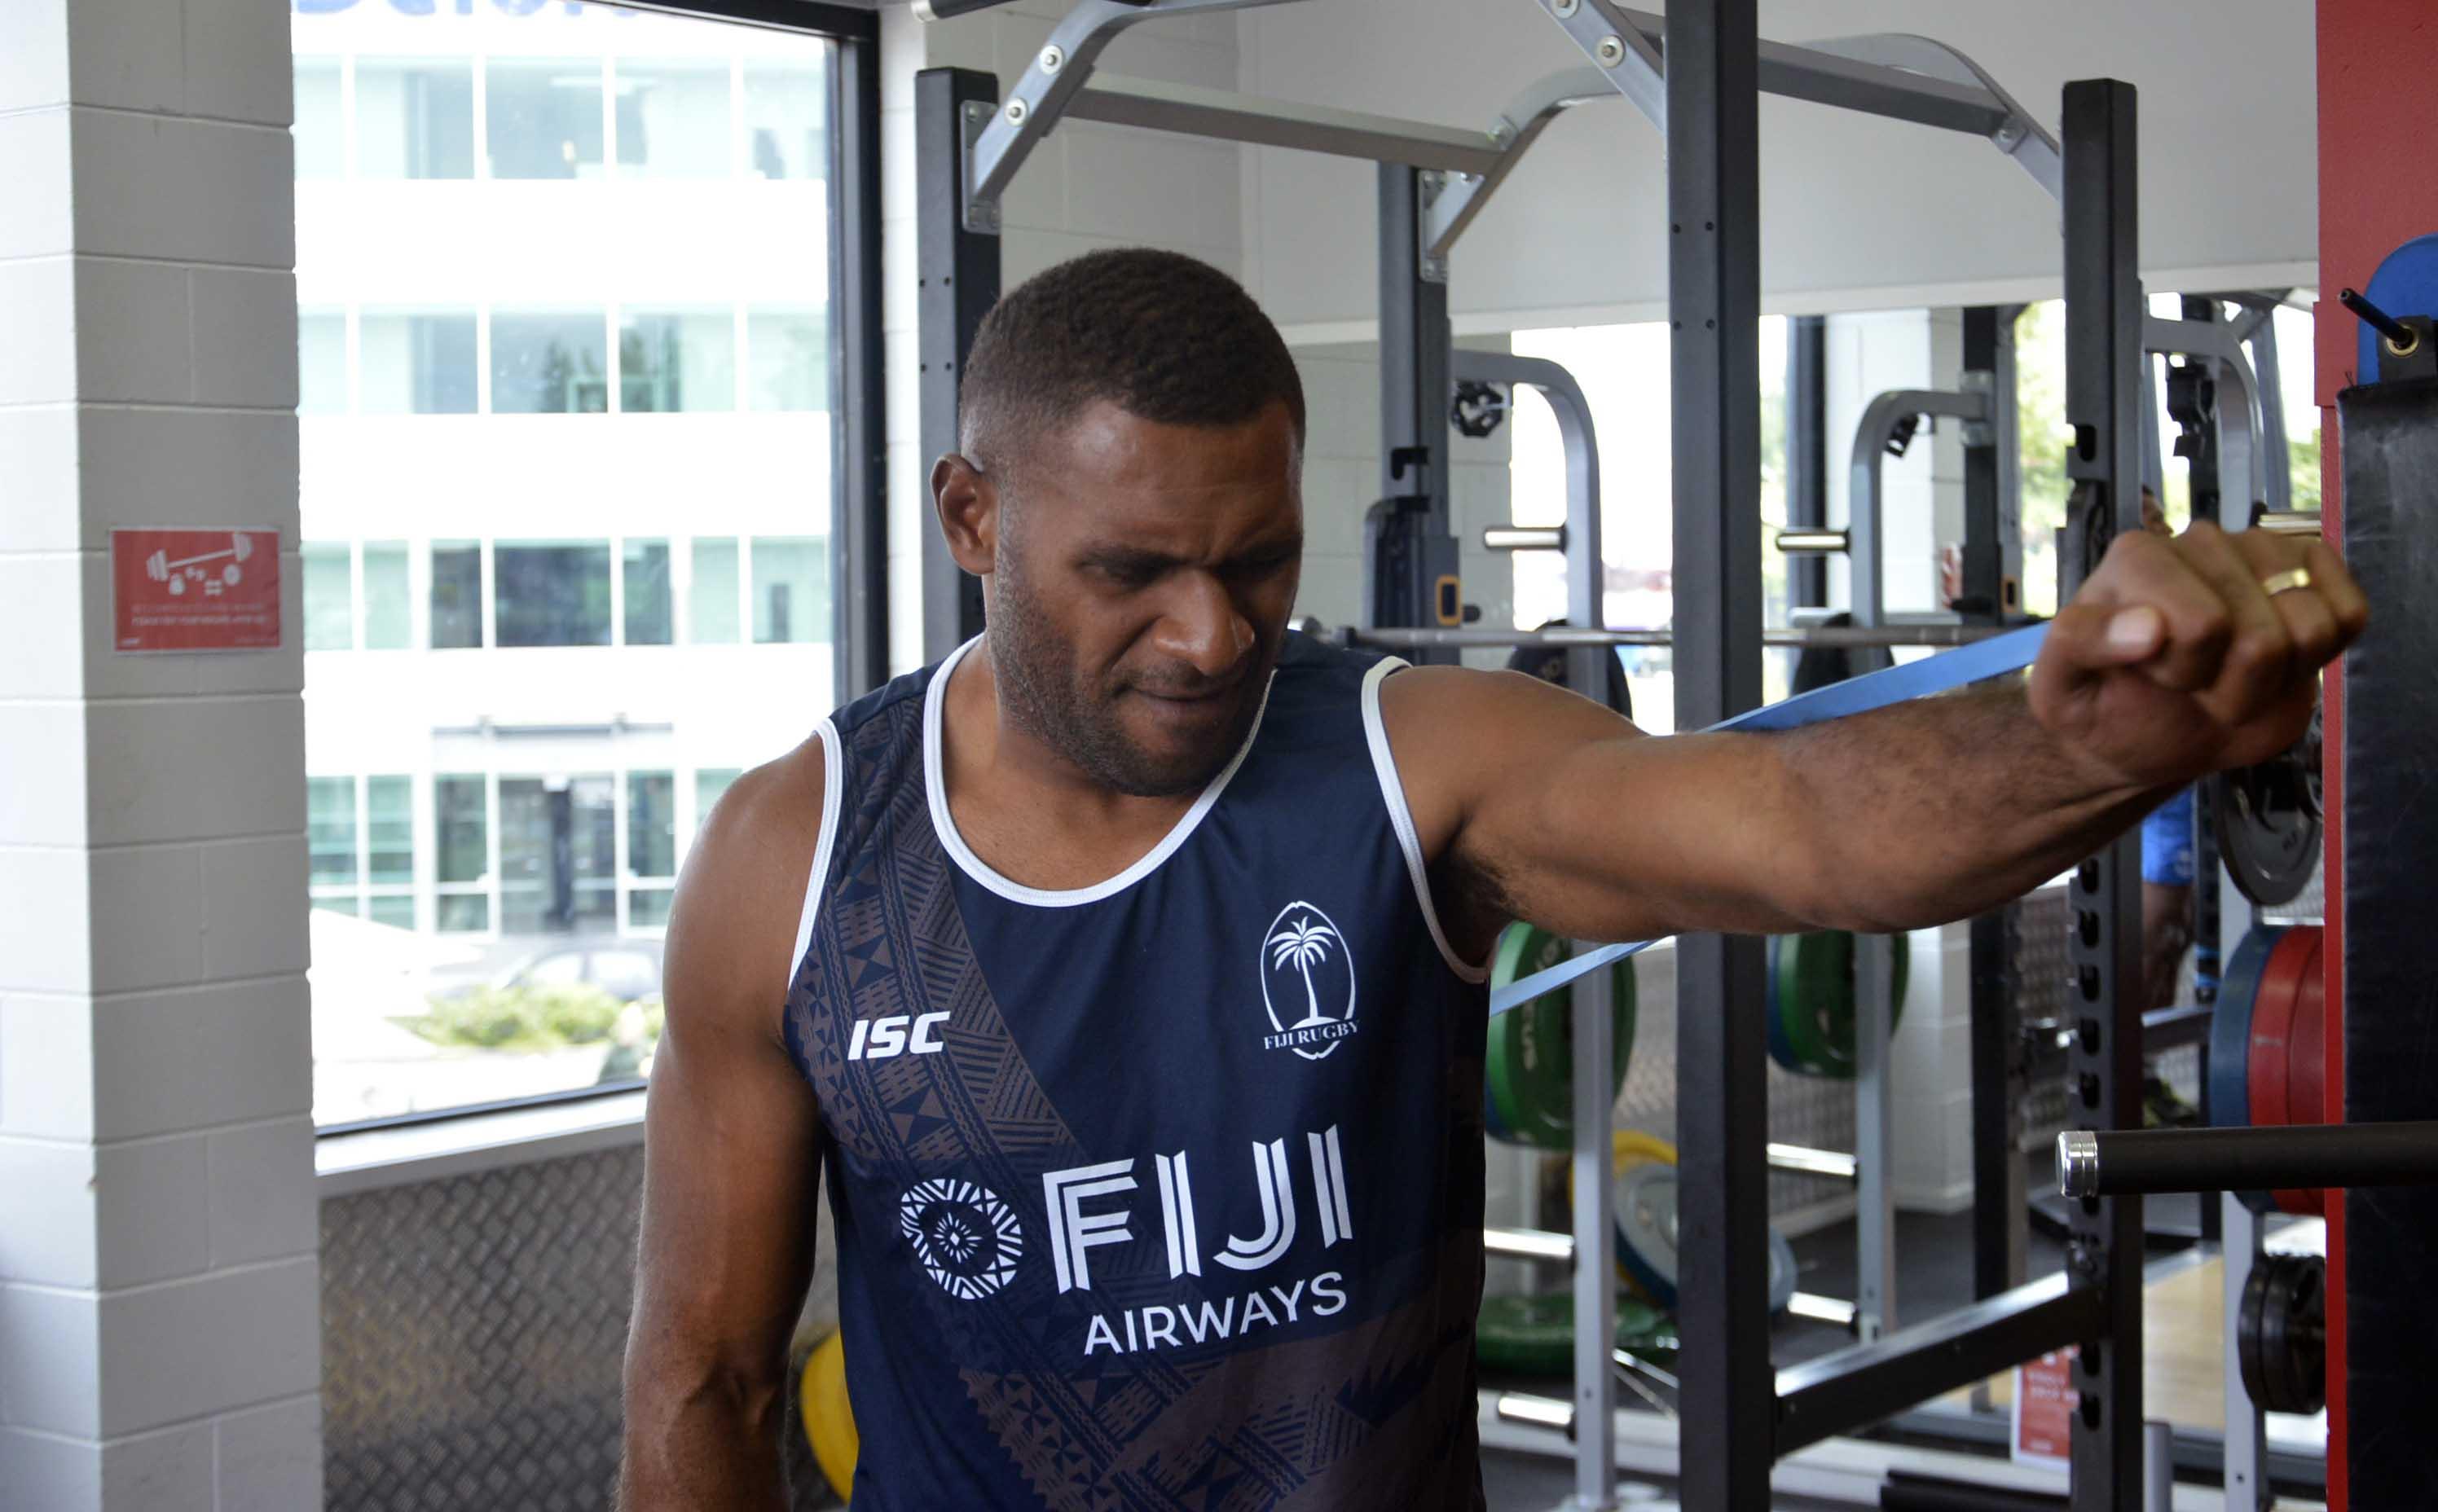 Jasa Veremalua during training at fastlane Fitness gym at Hamilton, New Zealand yesterday. Picture: BALJEET SINGH